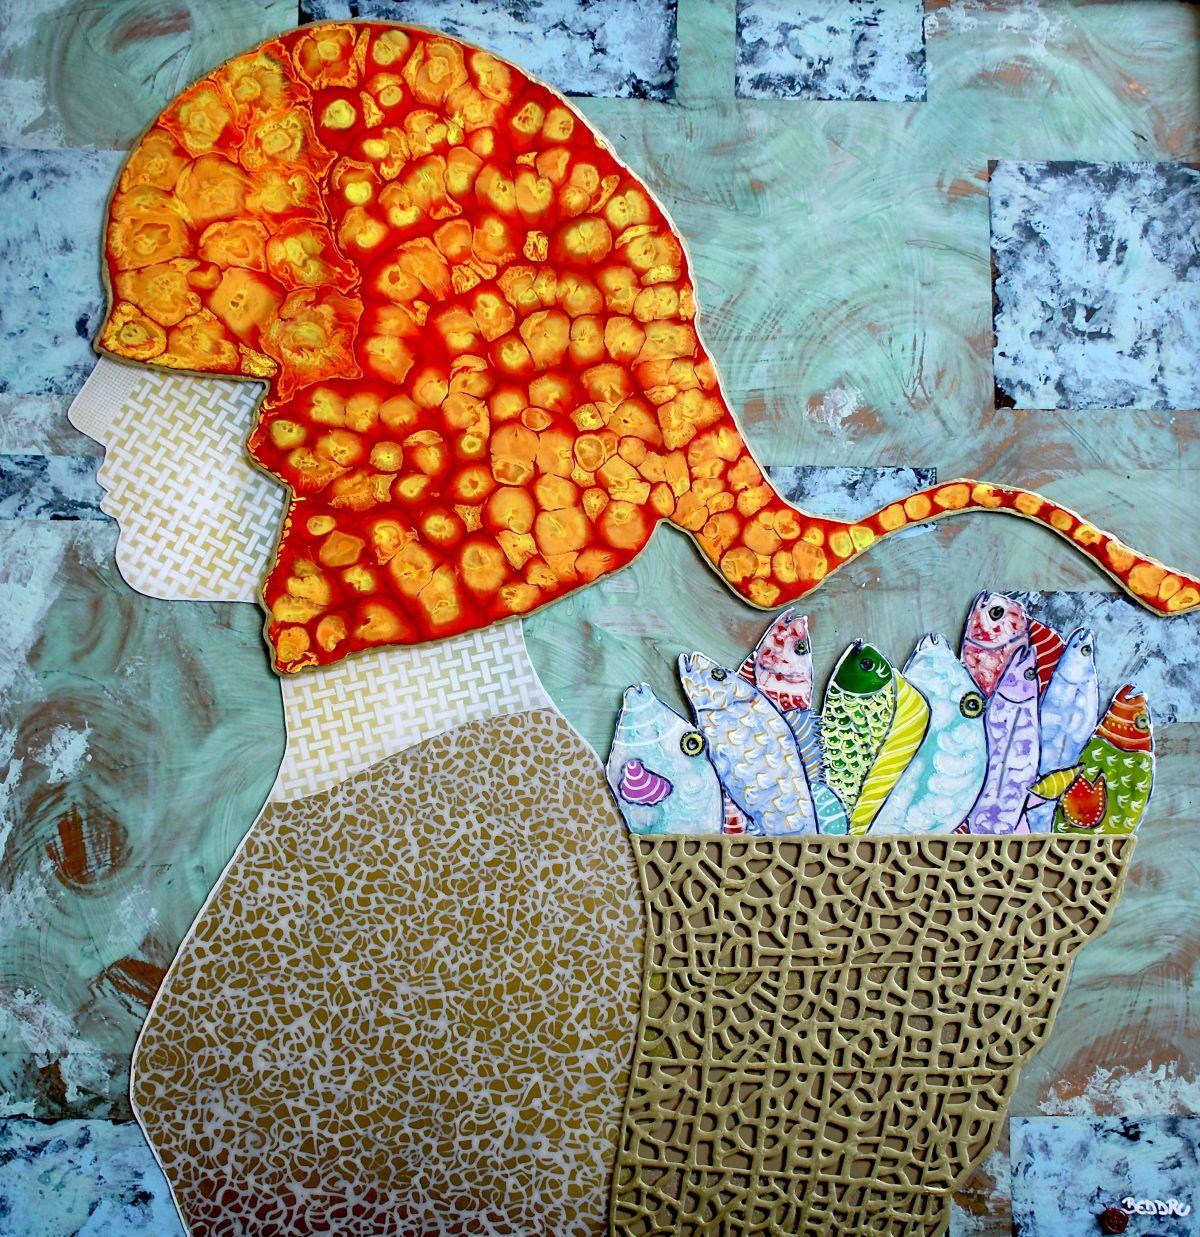 Kunst: The Fish Seller van kunstenaar  Beddru